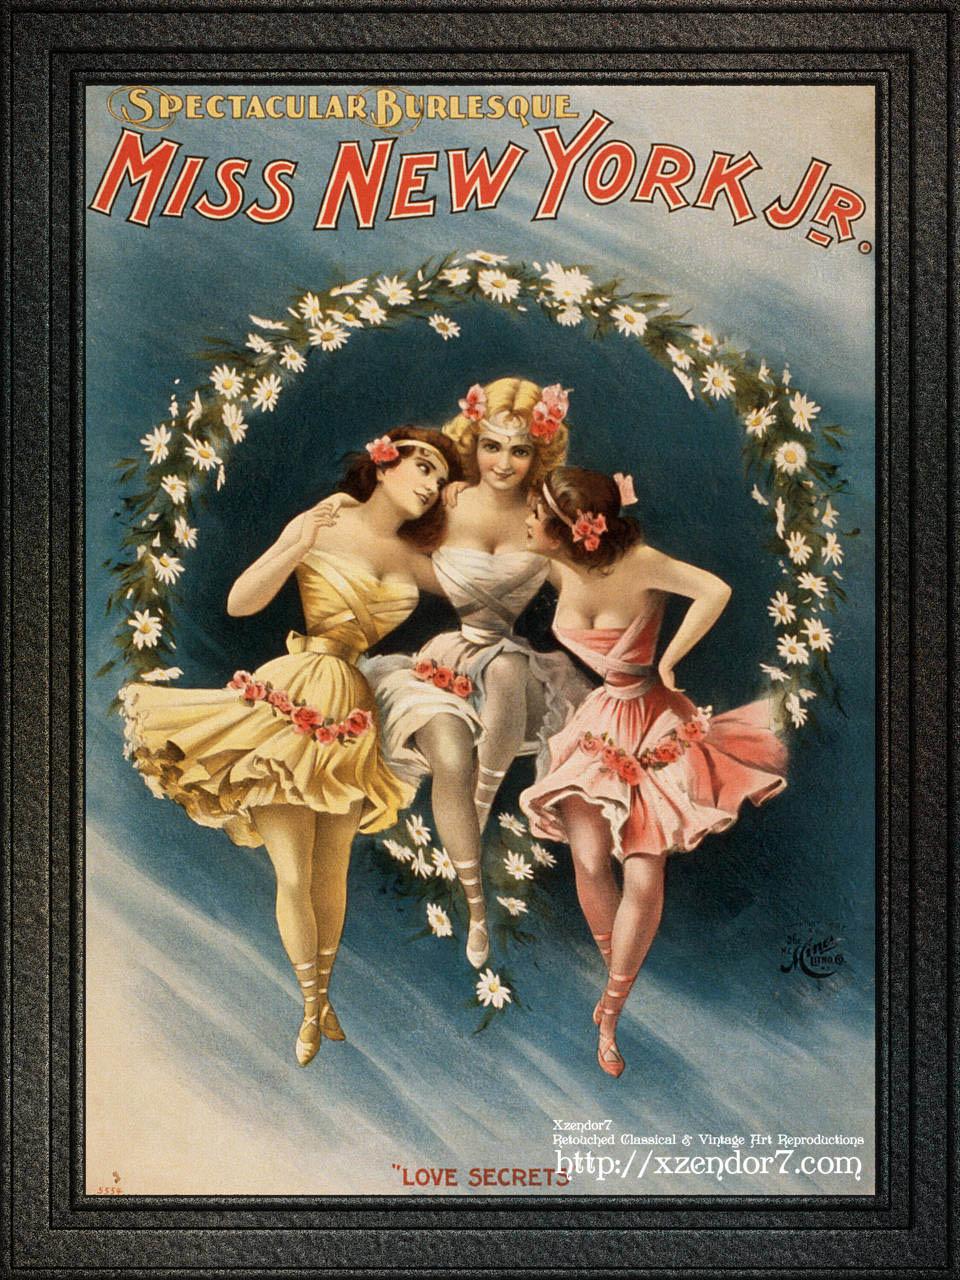 Miss New York Jr. Spectacular Burlesque Love Secrets